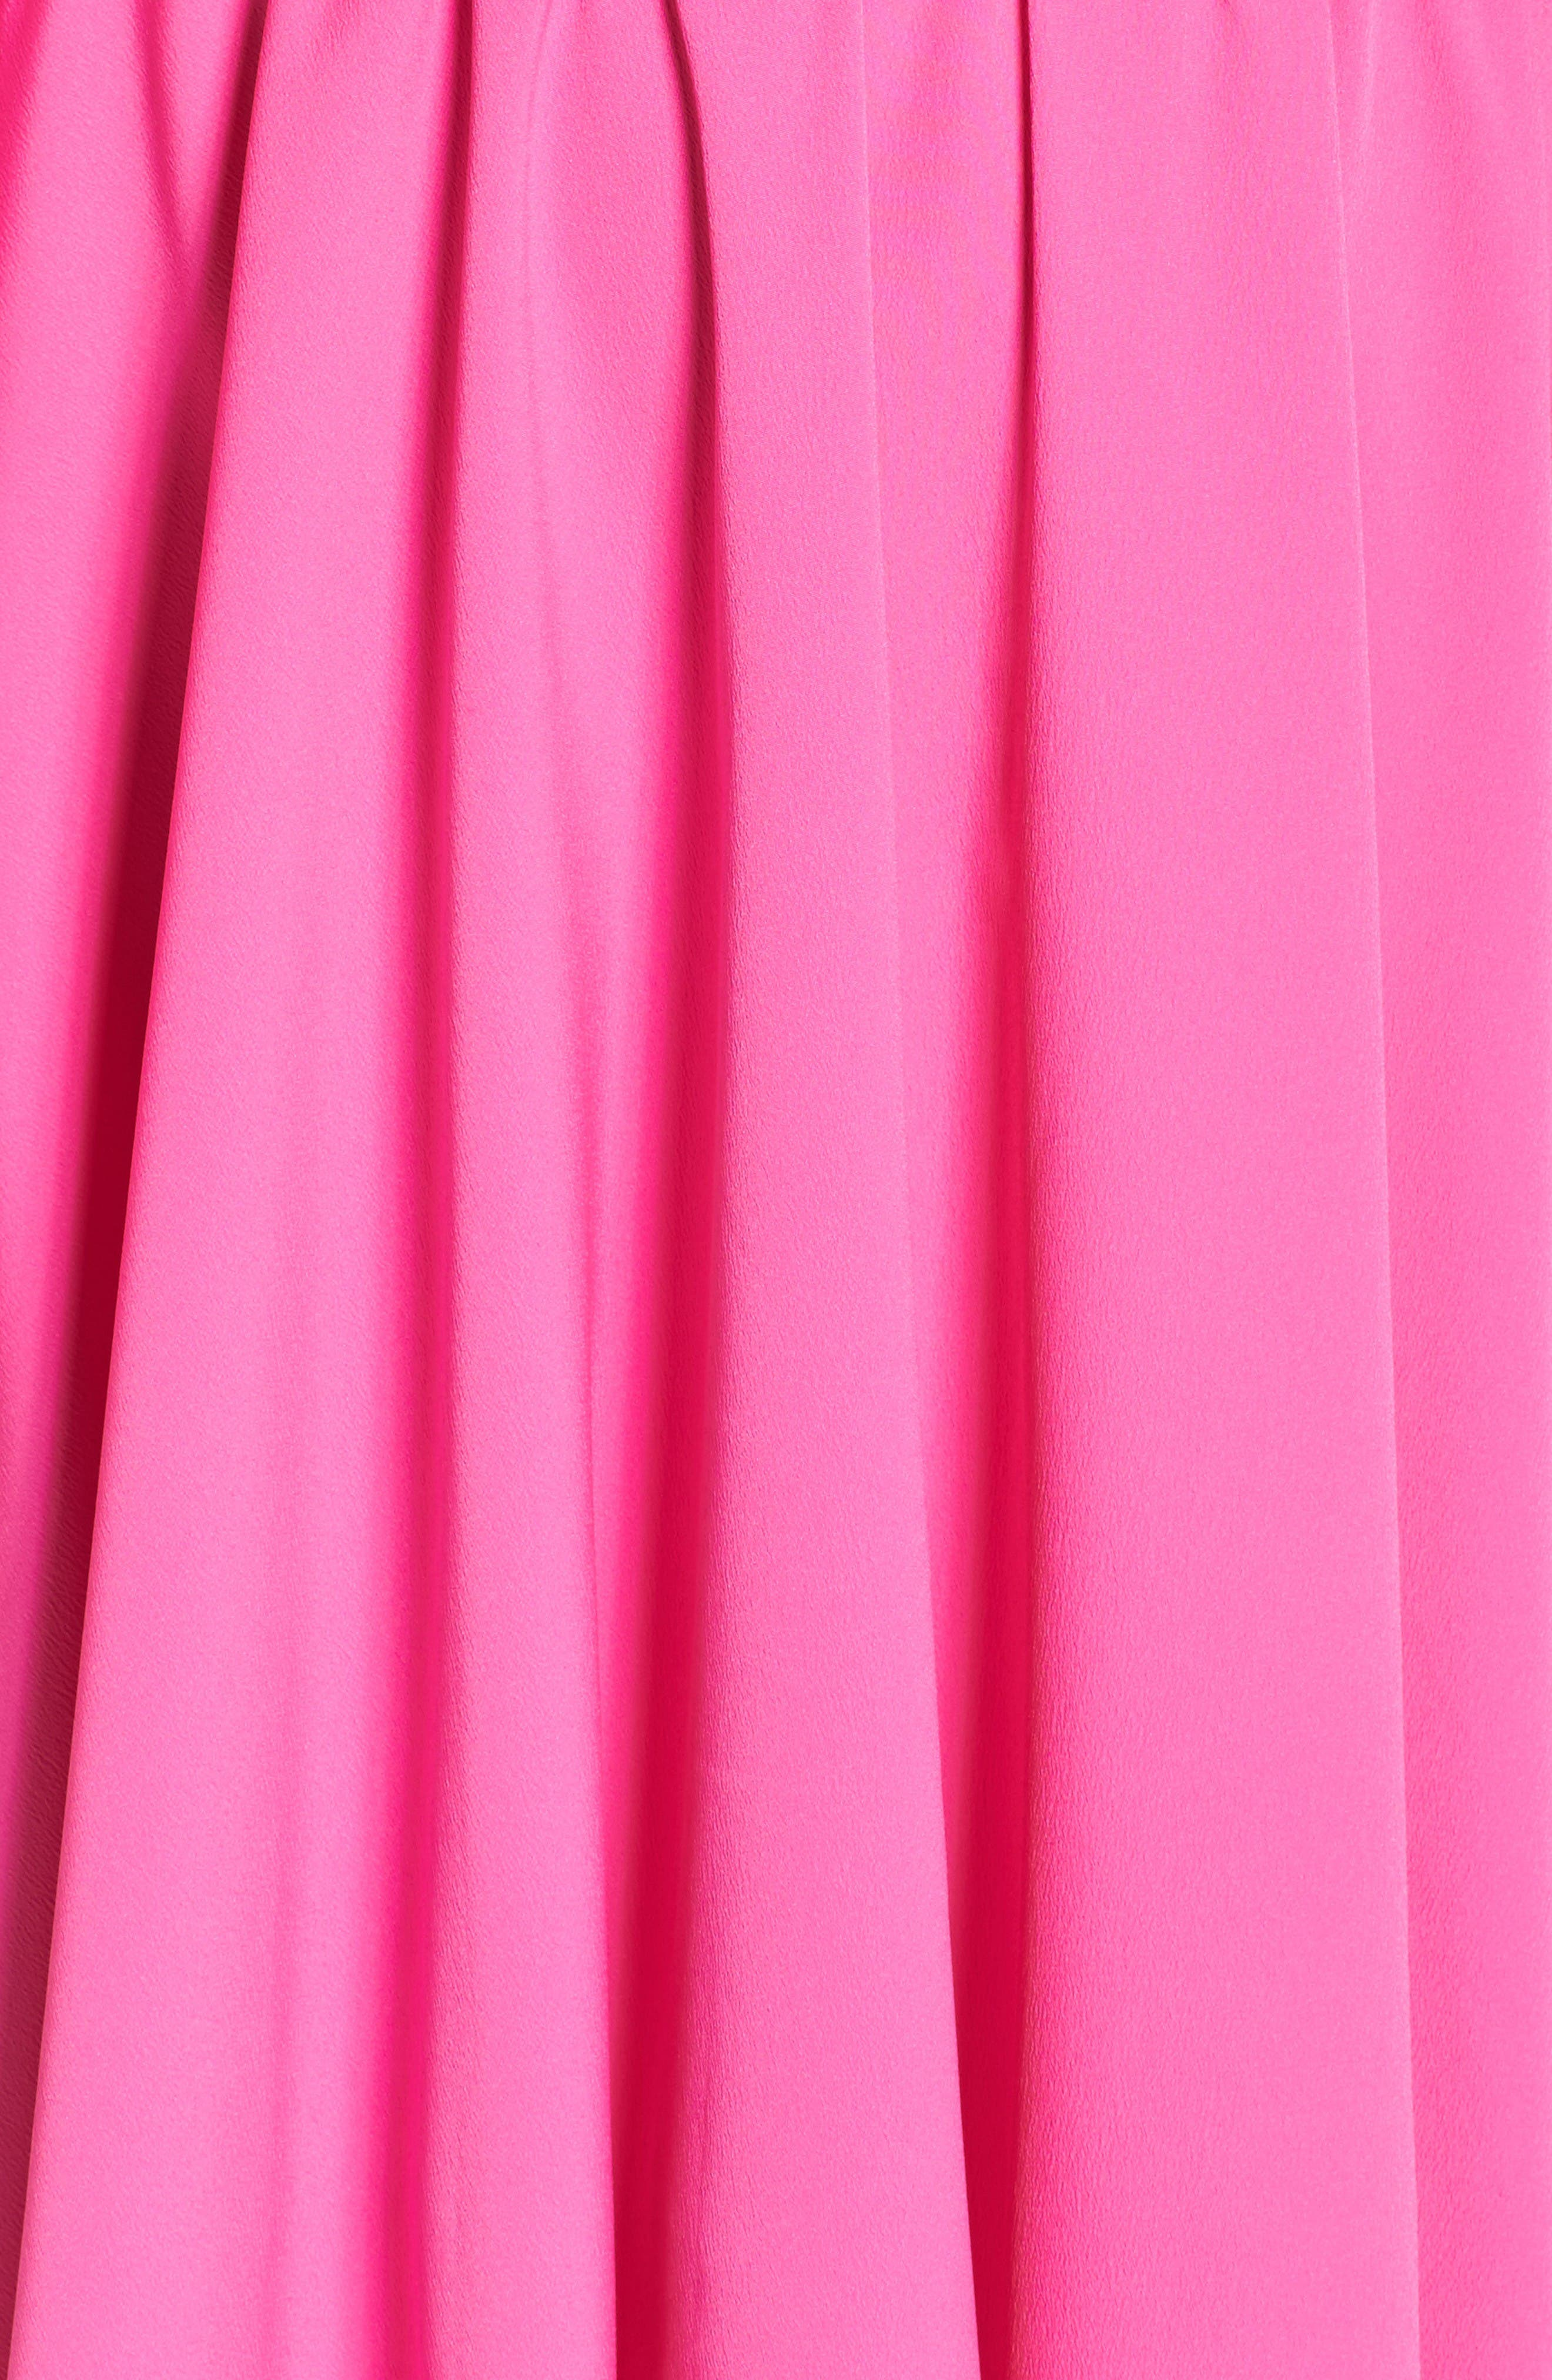 Tie Sleeve Fit & Flare Dress,                             Alternate thumbnail 6, color,                             Fuchsia